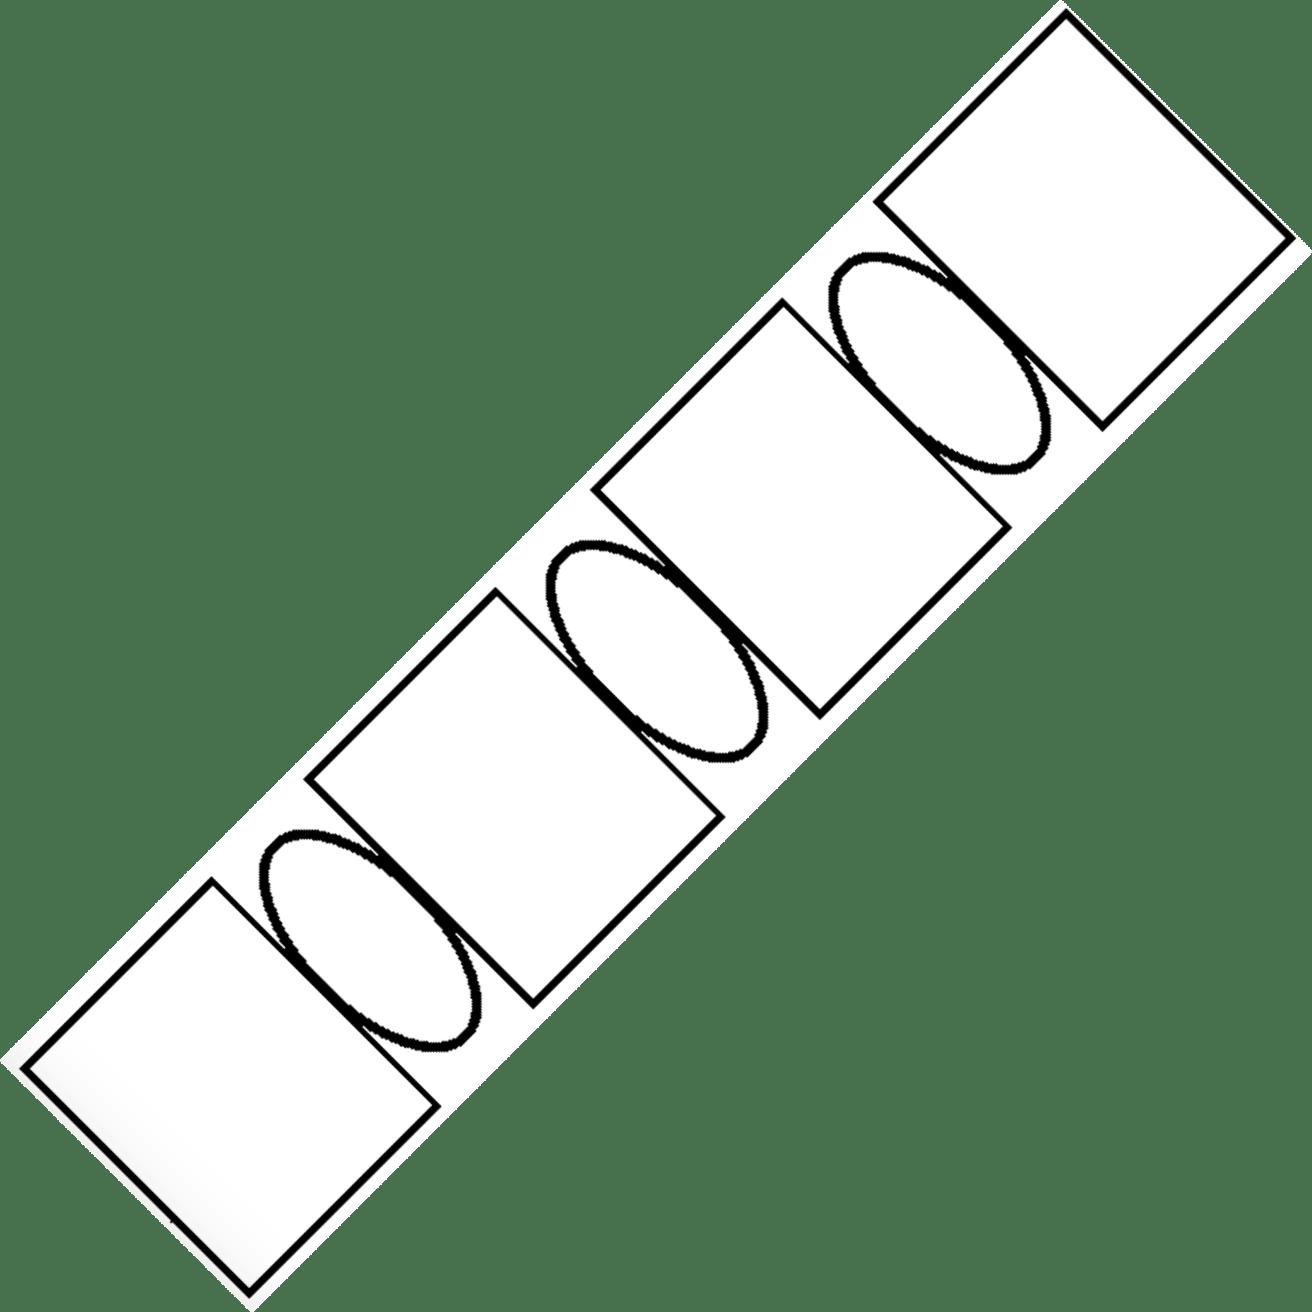 vertebra-discs-spine-drawing-rotated-1